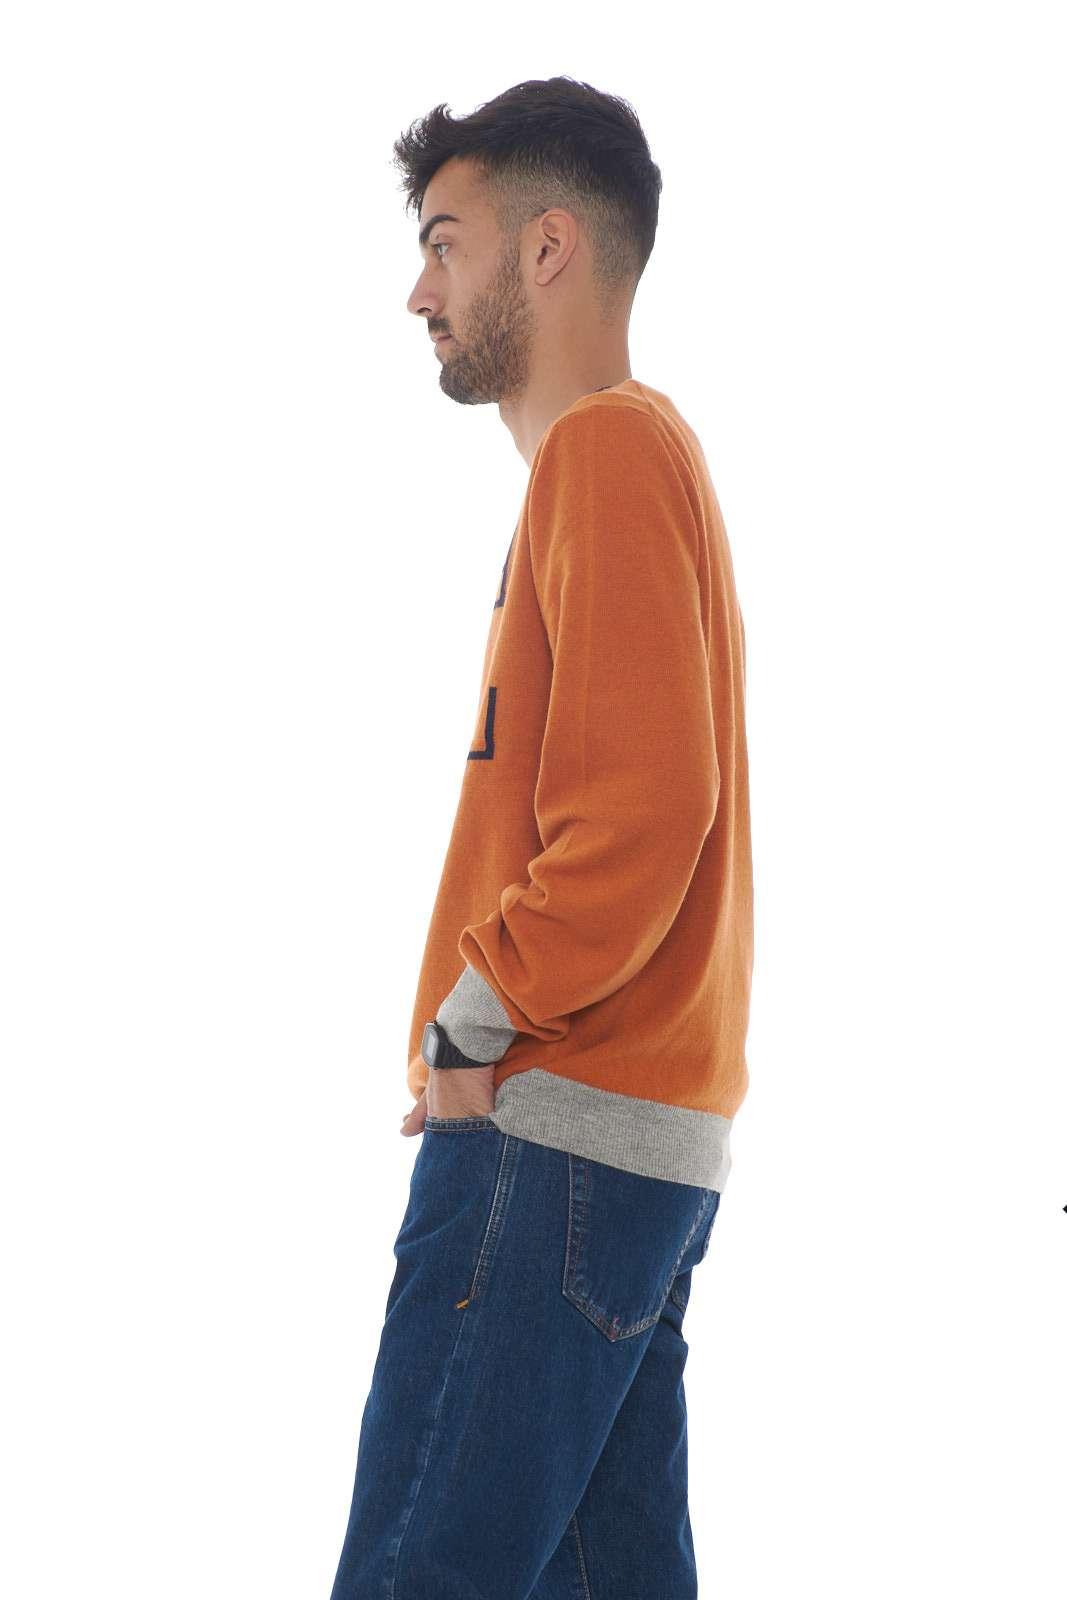 https://www.parmax.com/media/catalog/product/a/i/AI-outlet_parmax-maglia-uomo-Acquapura-008-B.jpg